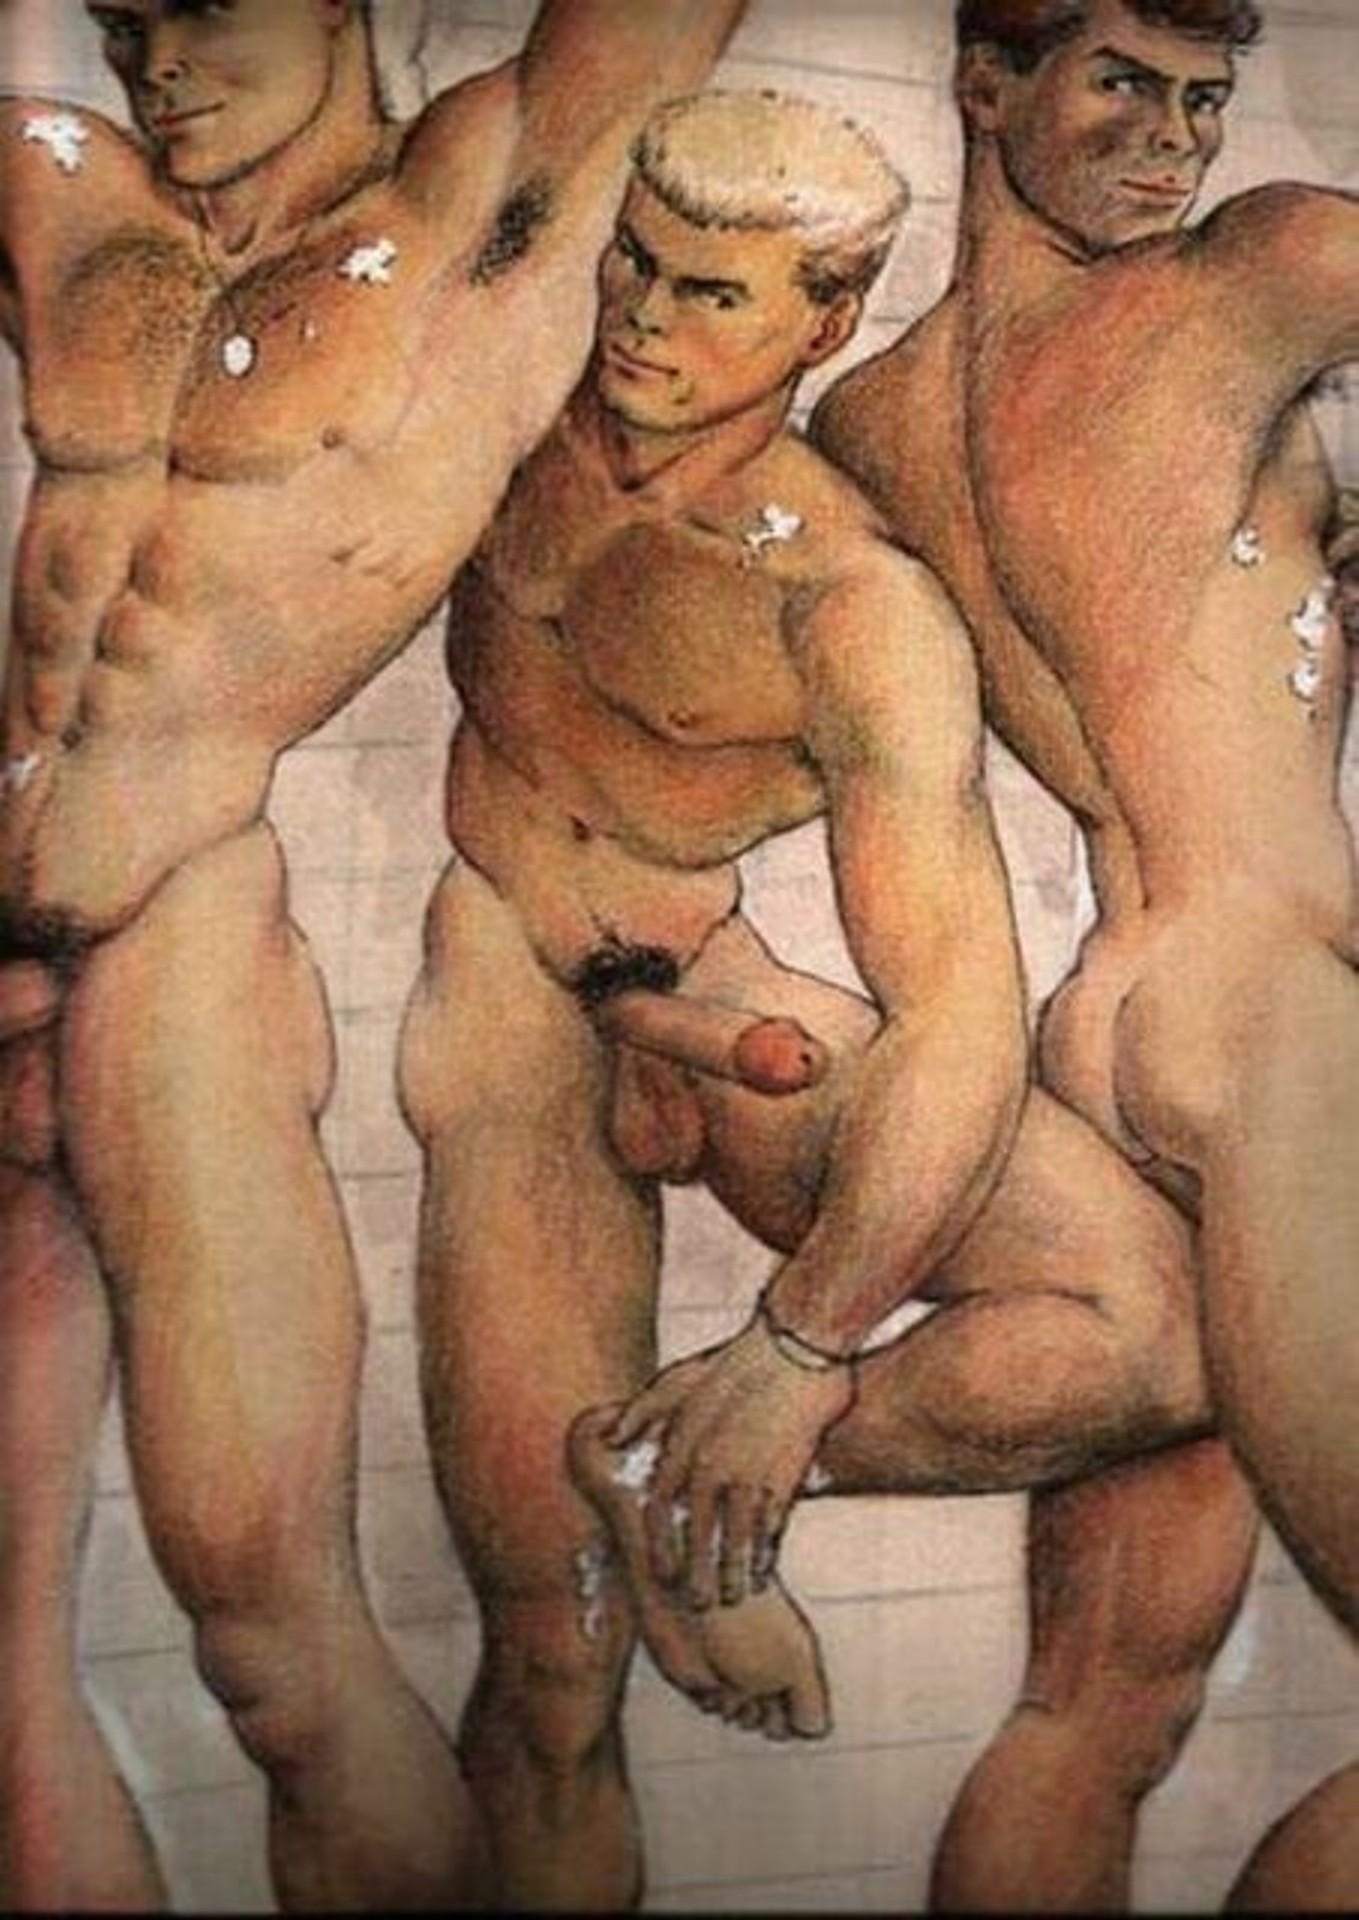 erotika-gey-tema